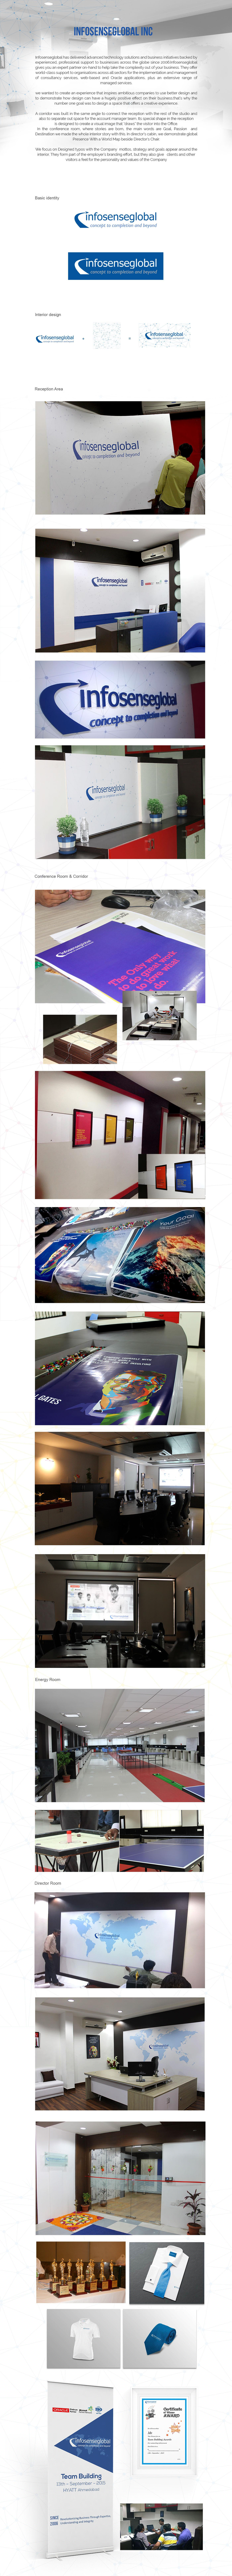 LOGO IDENTITY stationary graphicdesign Infosenseglobal office branding